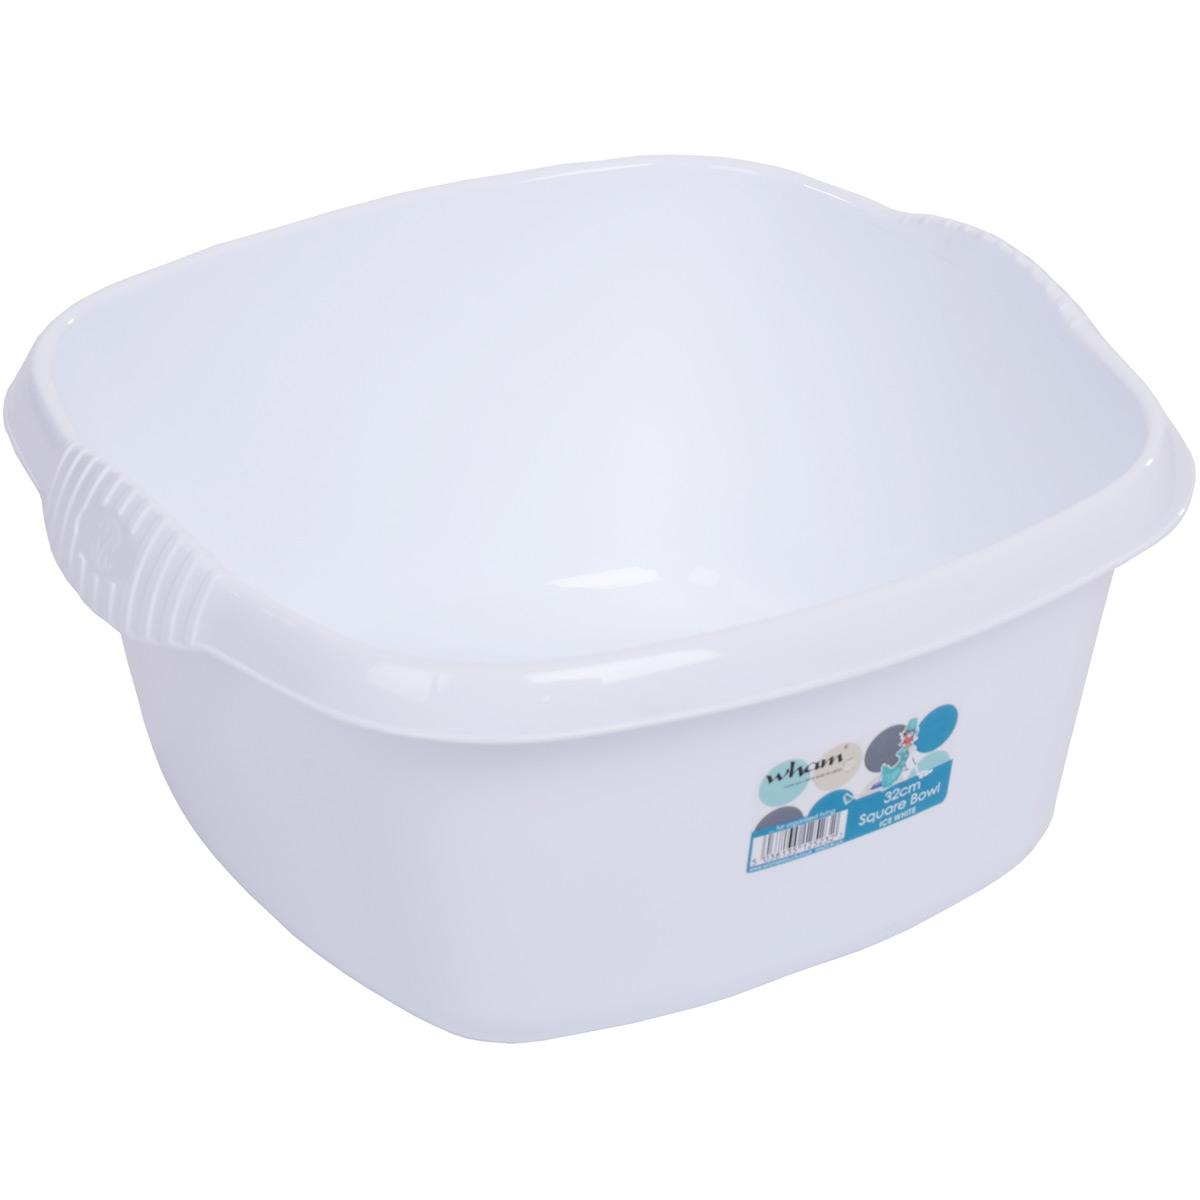 Spuelschuessel-Waschschuessel-Plastikschuessel-Kunststoff-Schuessel-Camping-Spuele-9L